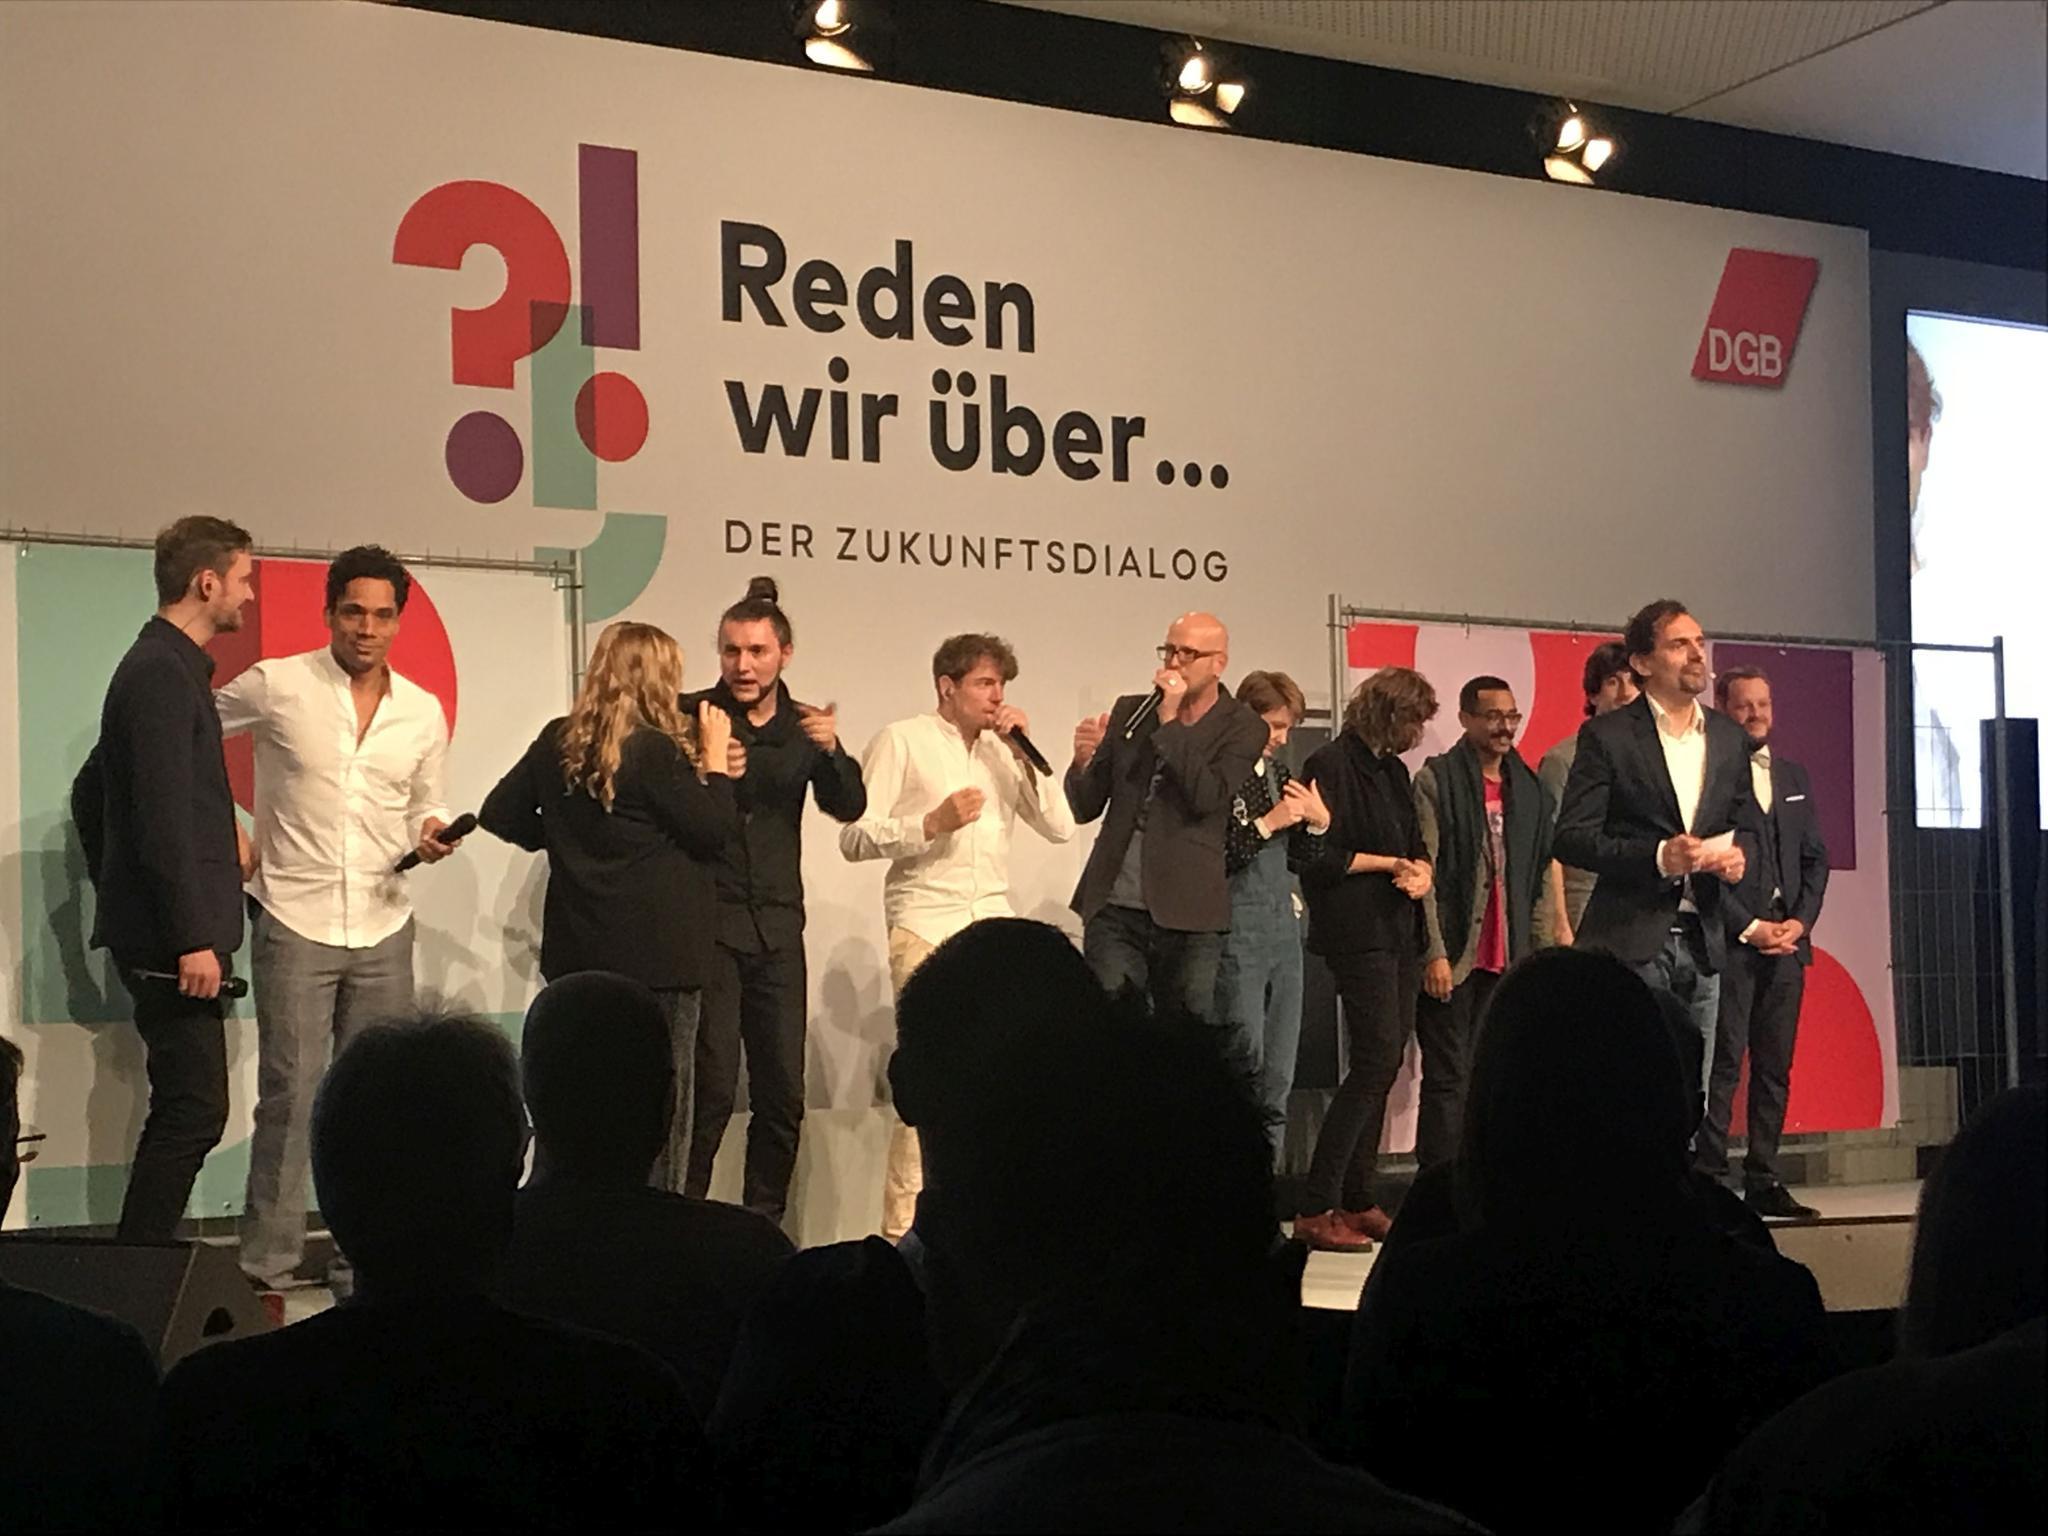 Der Zukunftsdialog in Berlin.